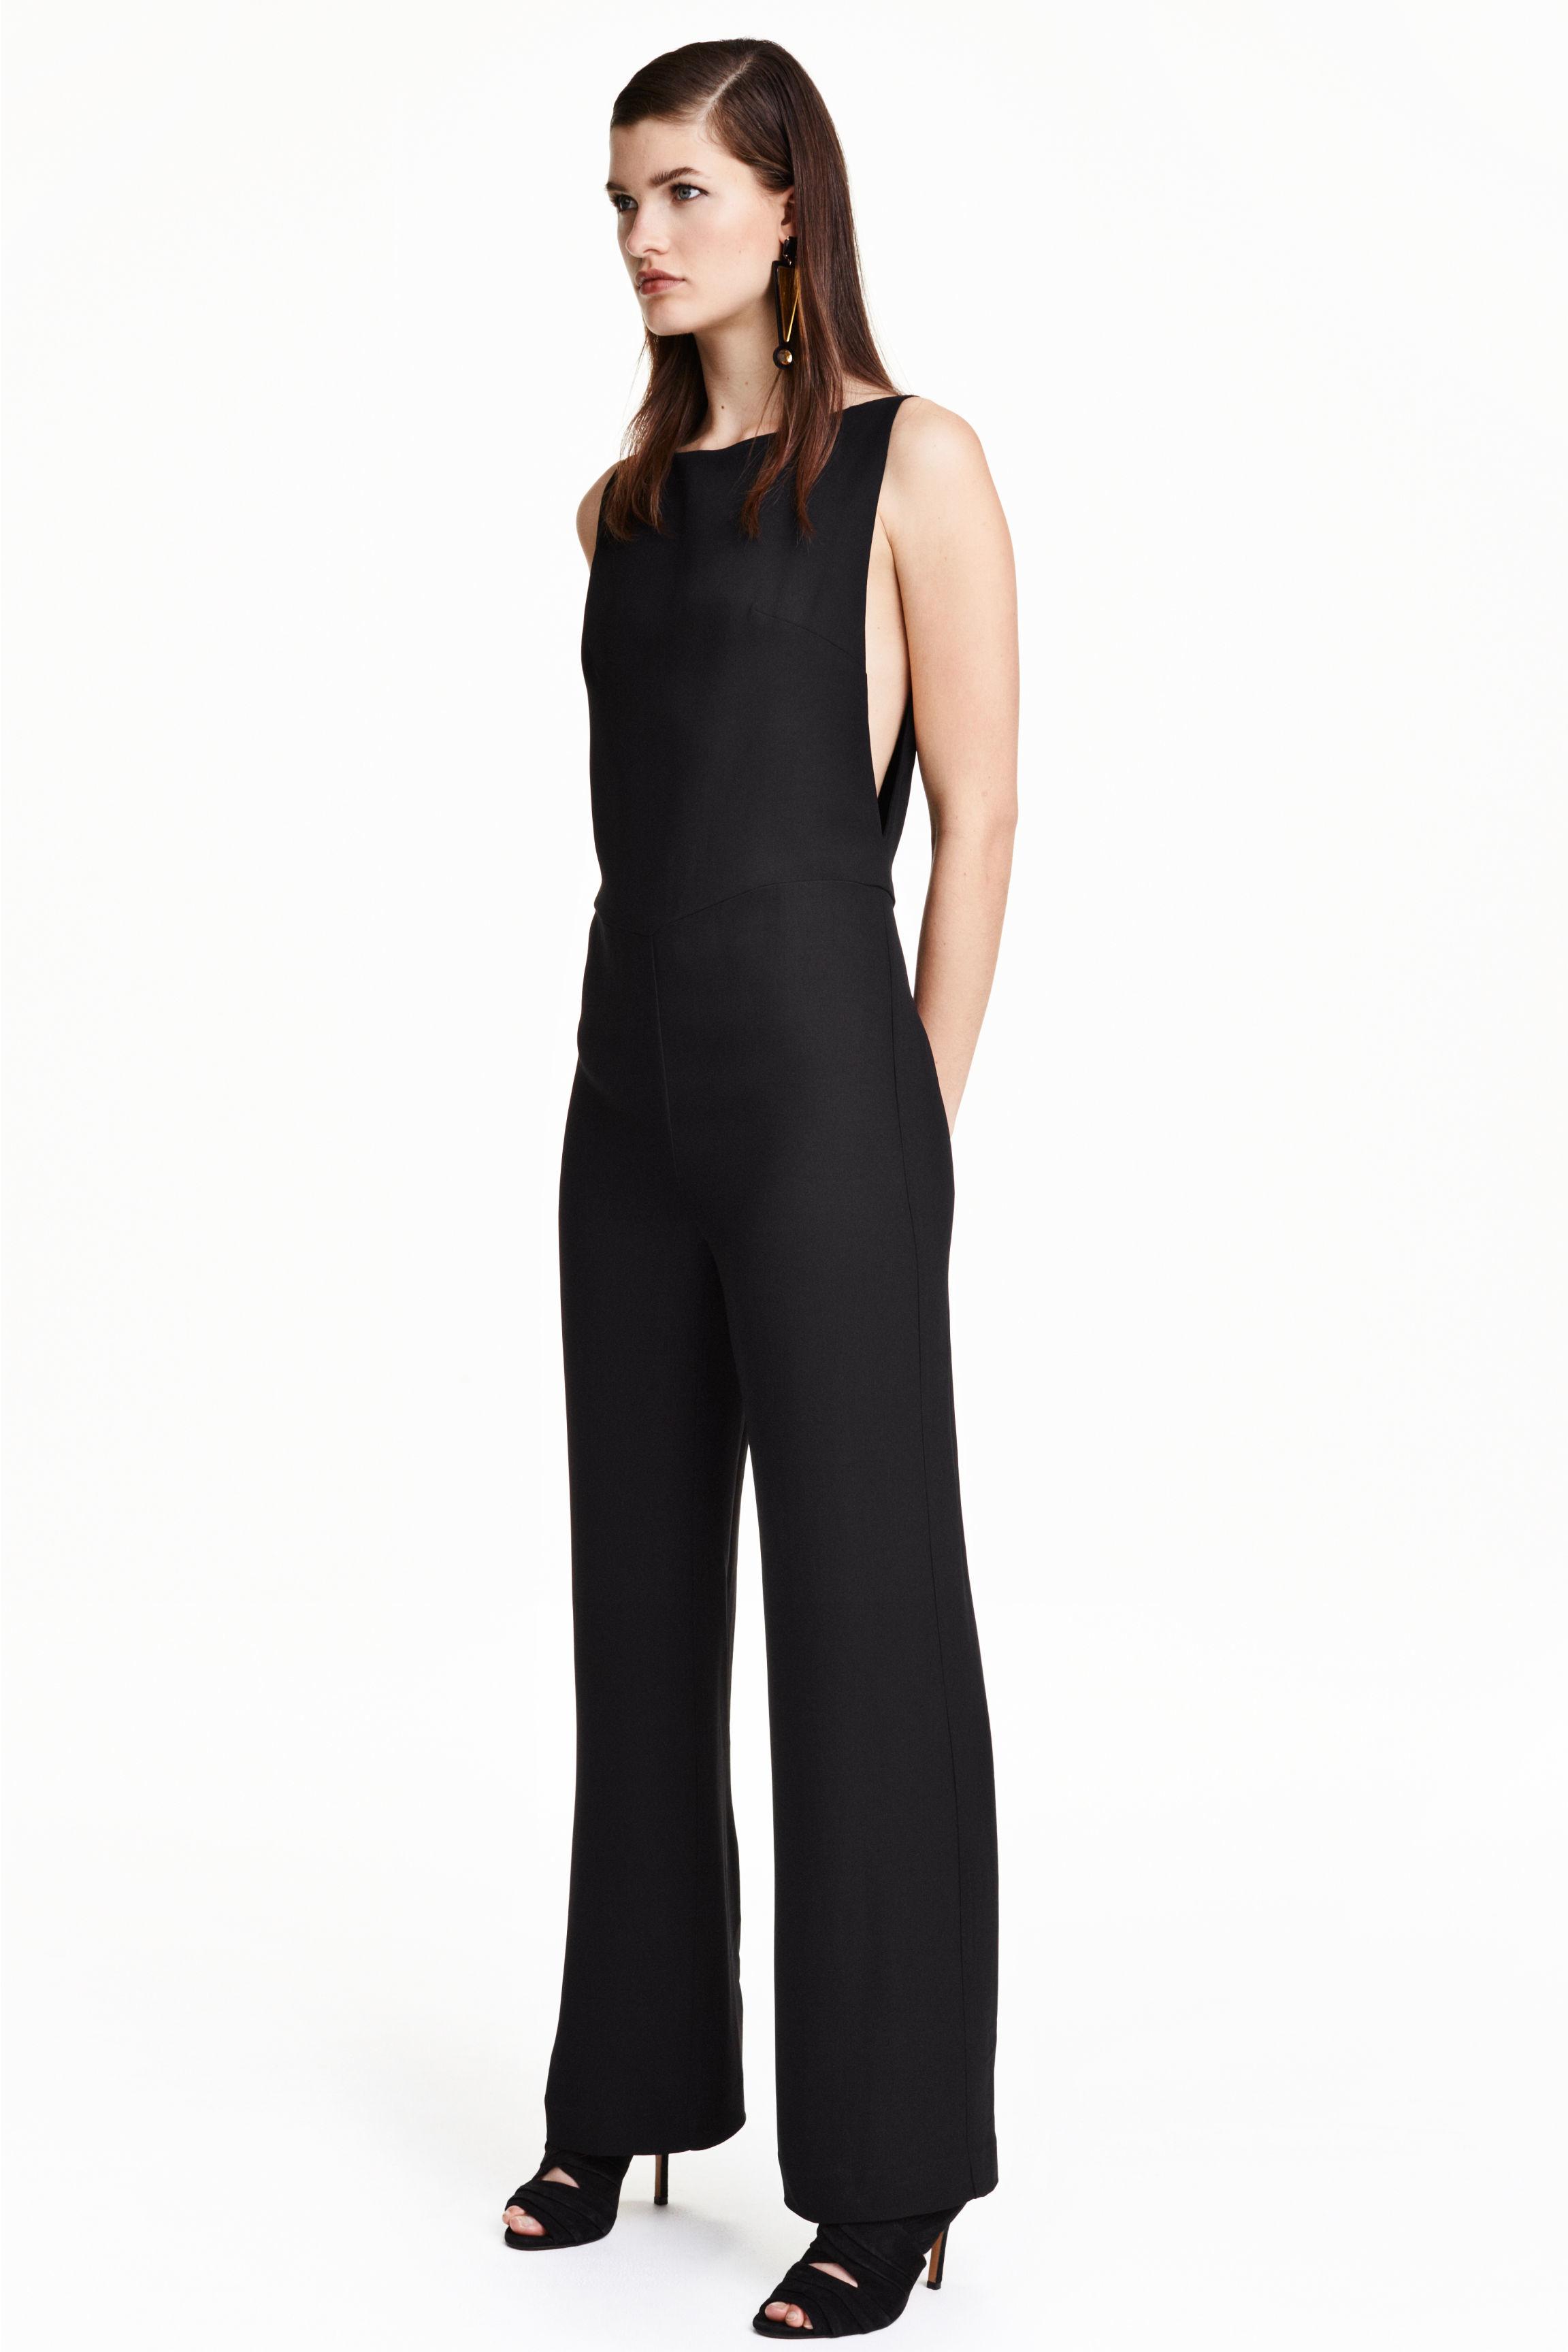 h m jumpsuit in a lyocell blend in black lyst. Black Bedroom Furniture Sets. Home Design Ideas